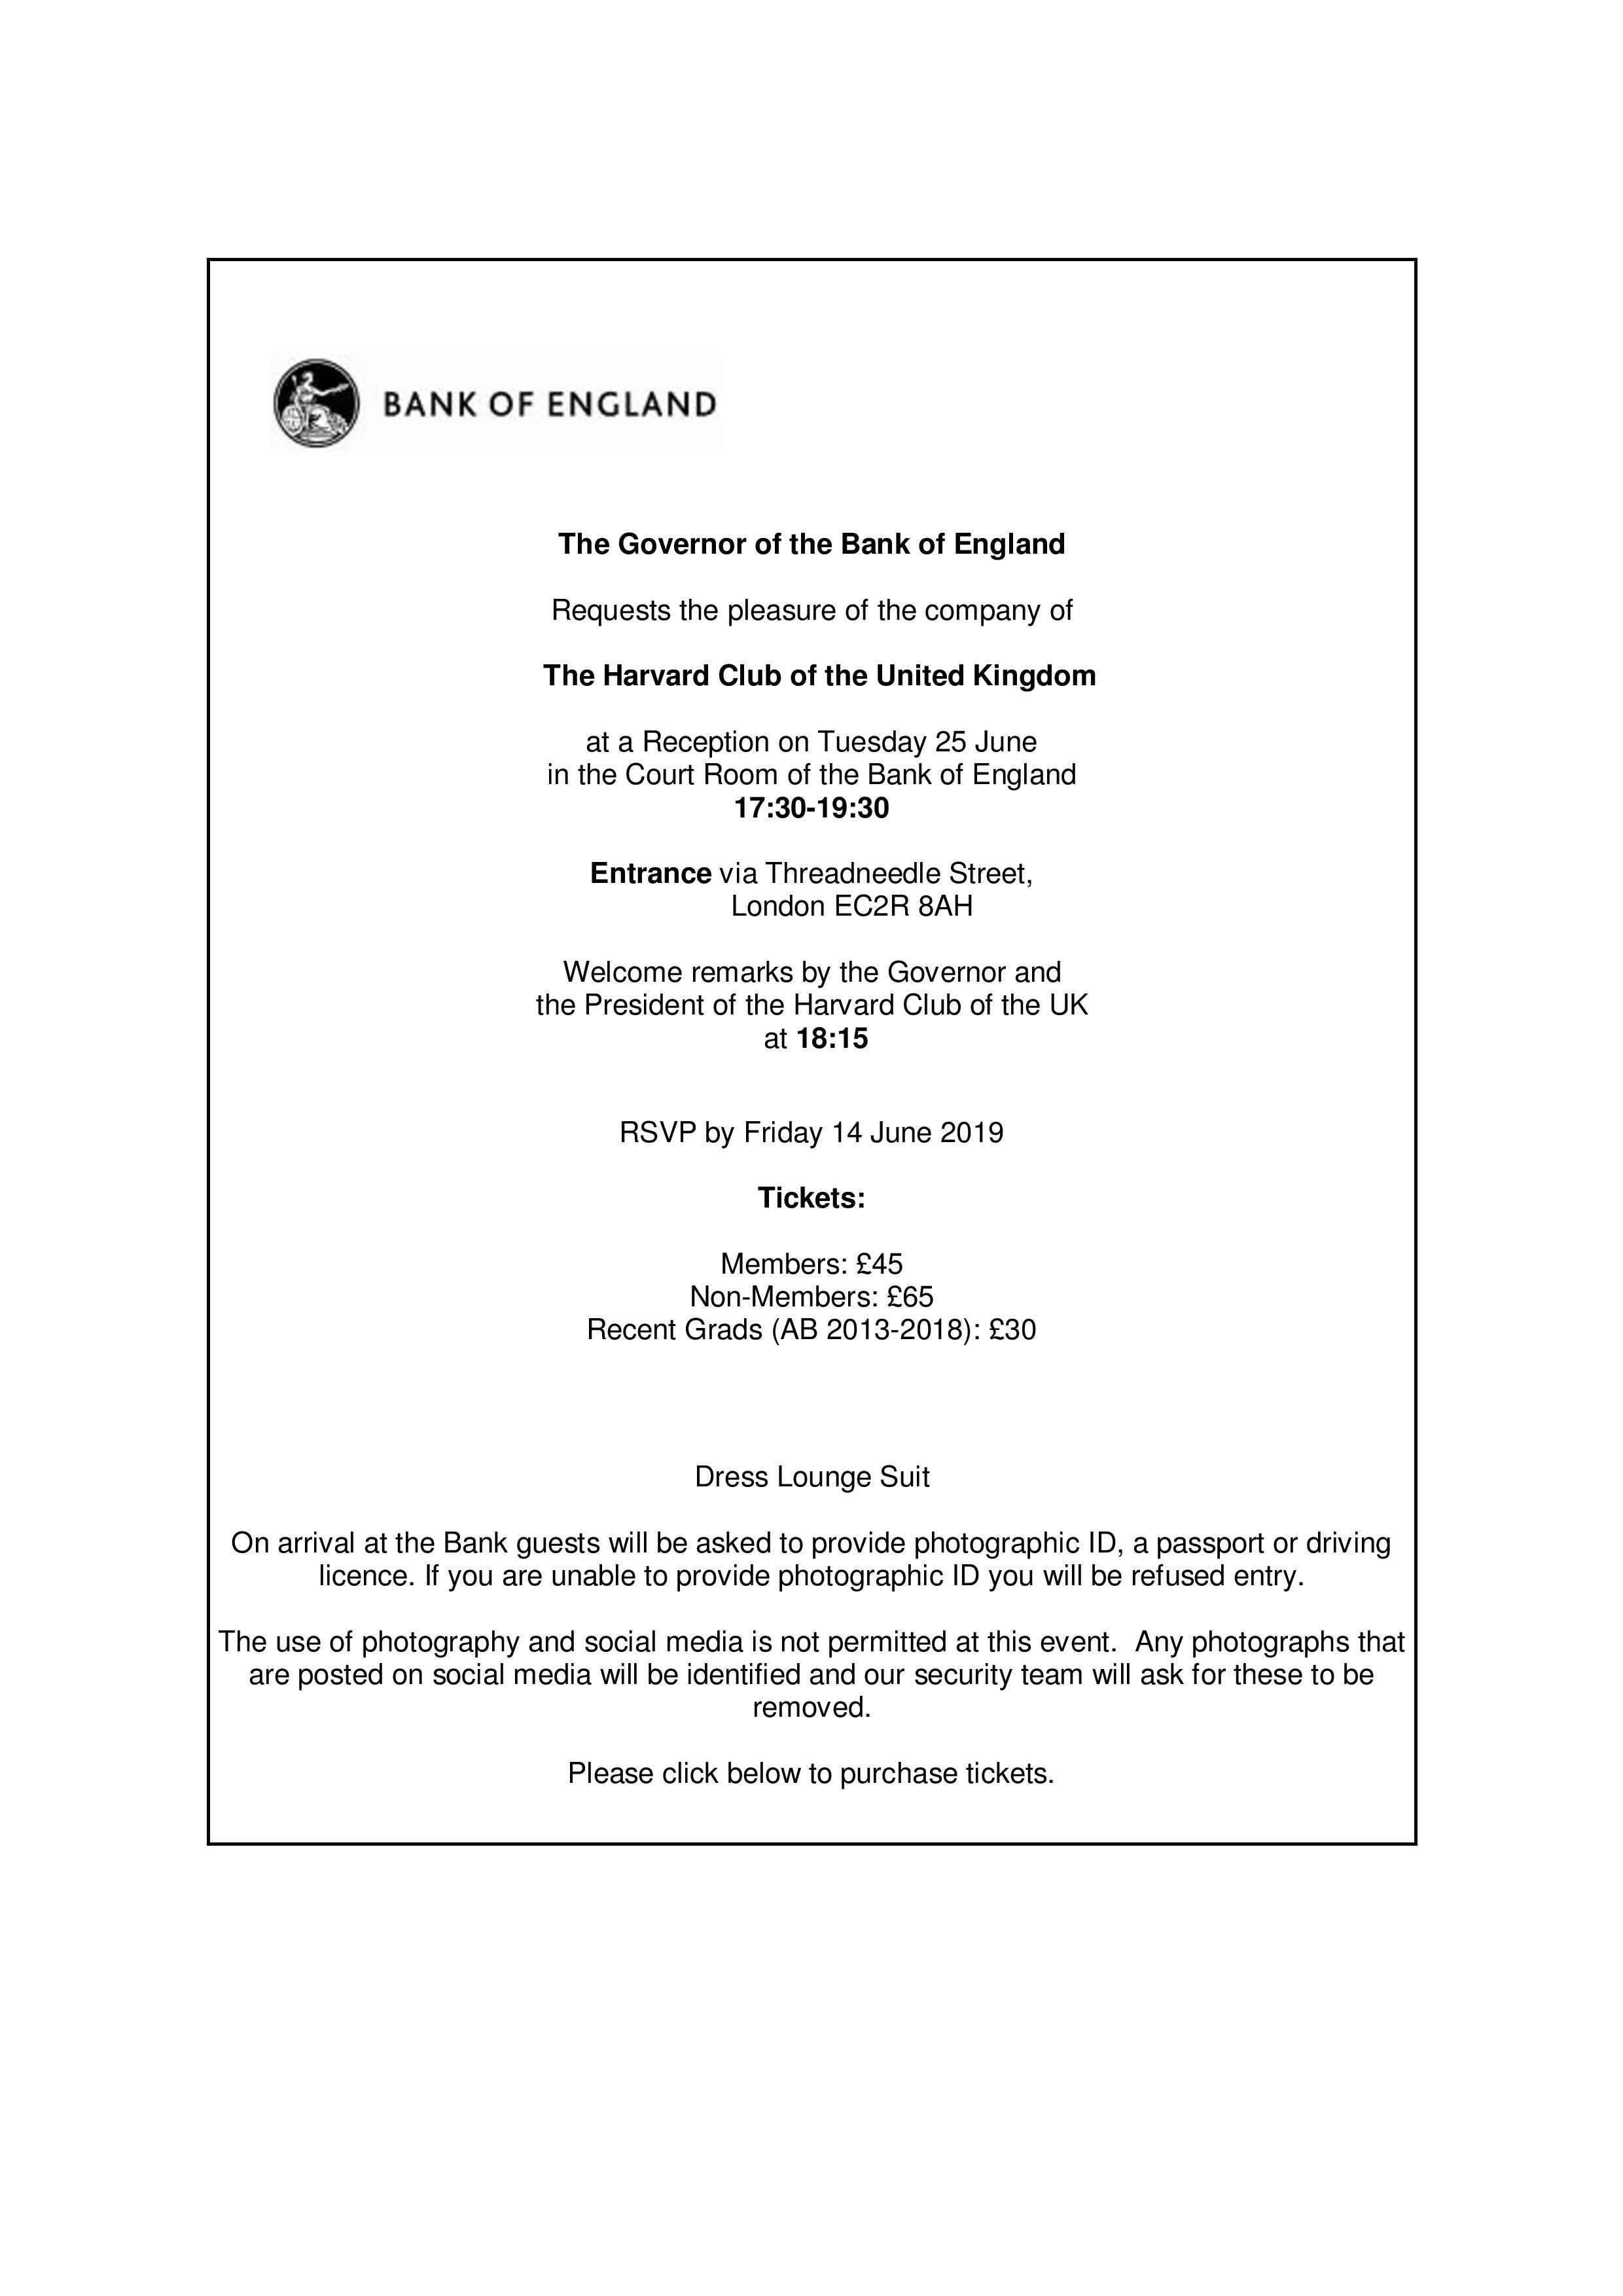 hcuk--bank-of-england-invitation-page-001